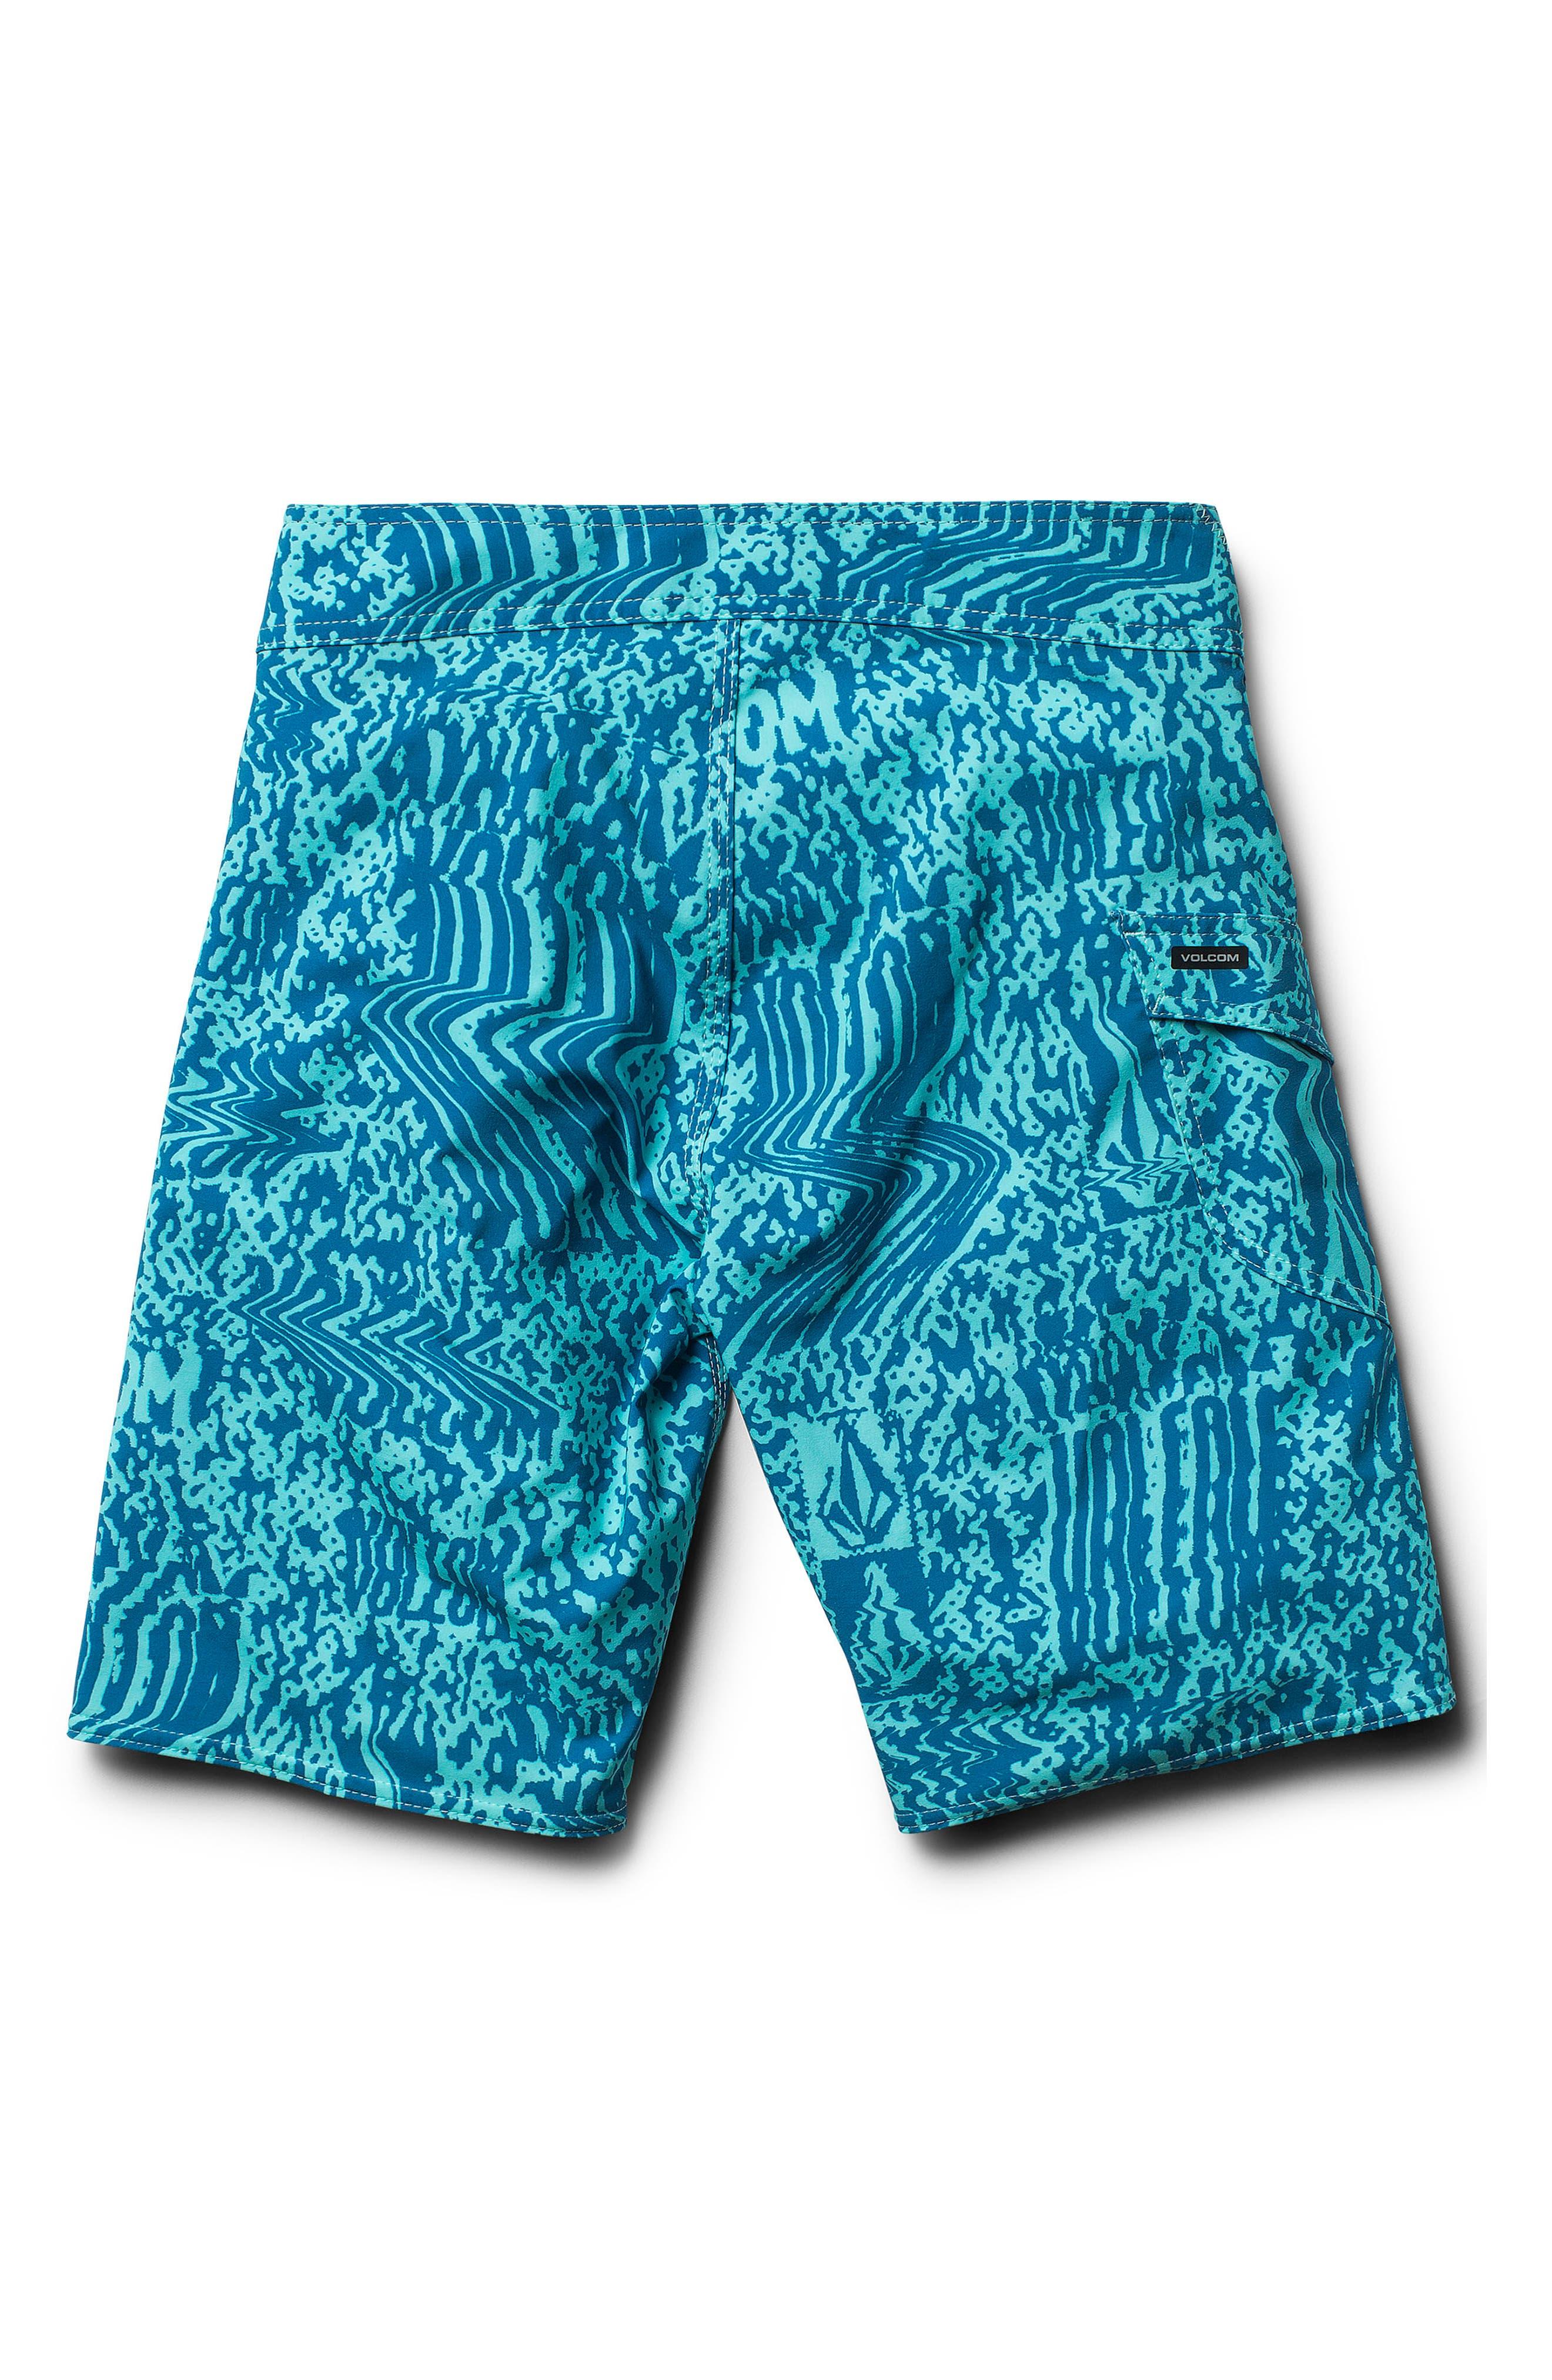 Logo Plasm Mod Board Shorts,                             Alternate thumbnail 2, color,                             Bright Turquoise